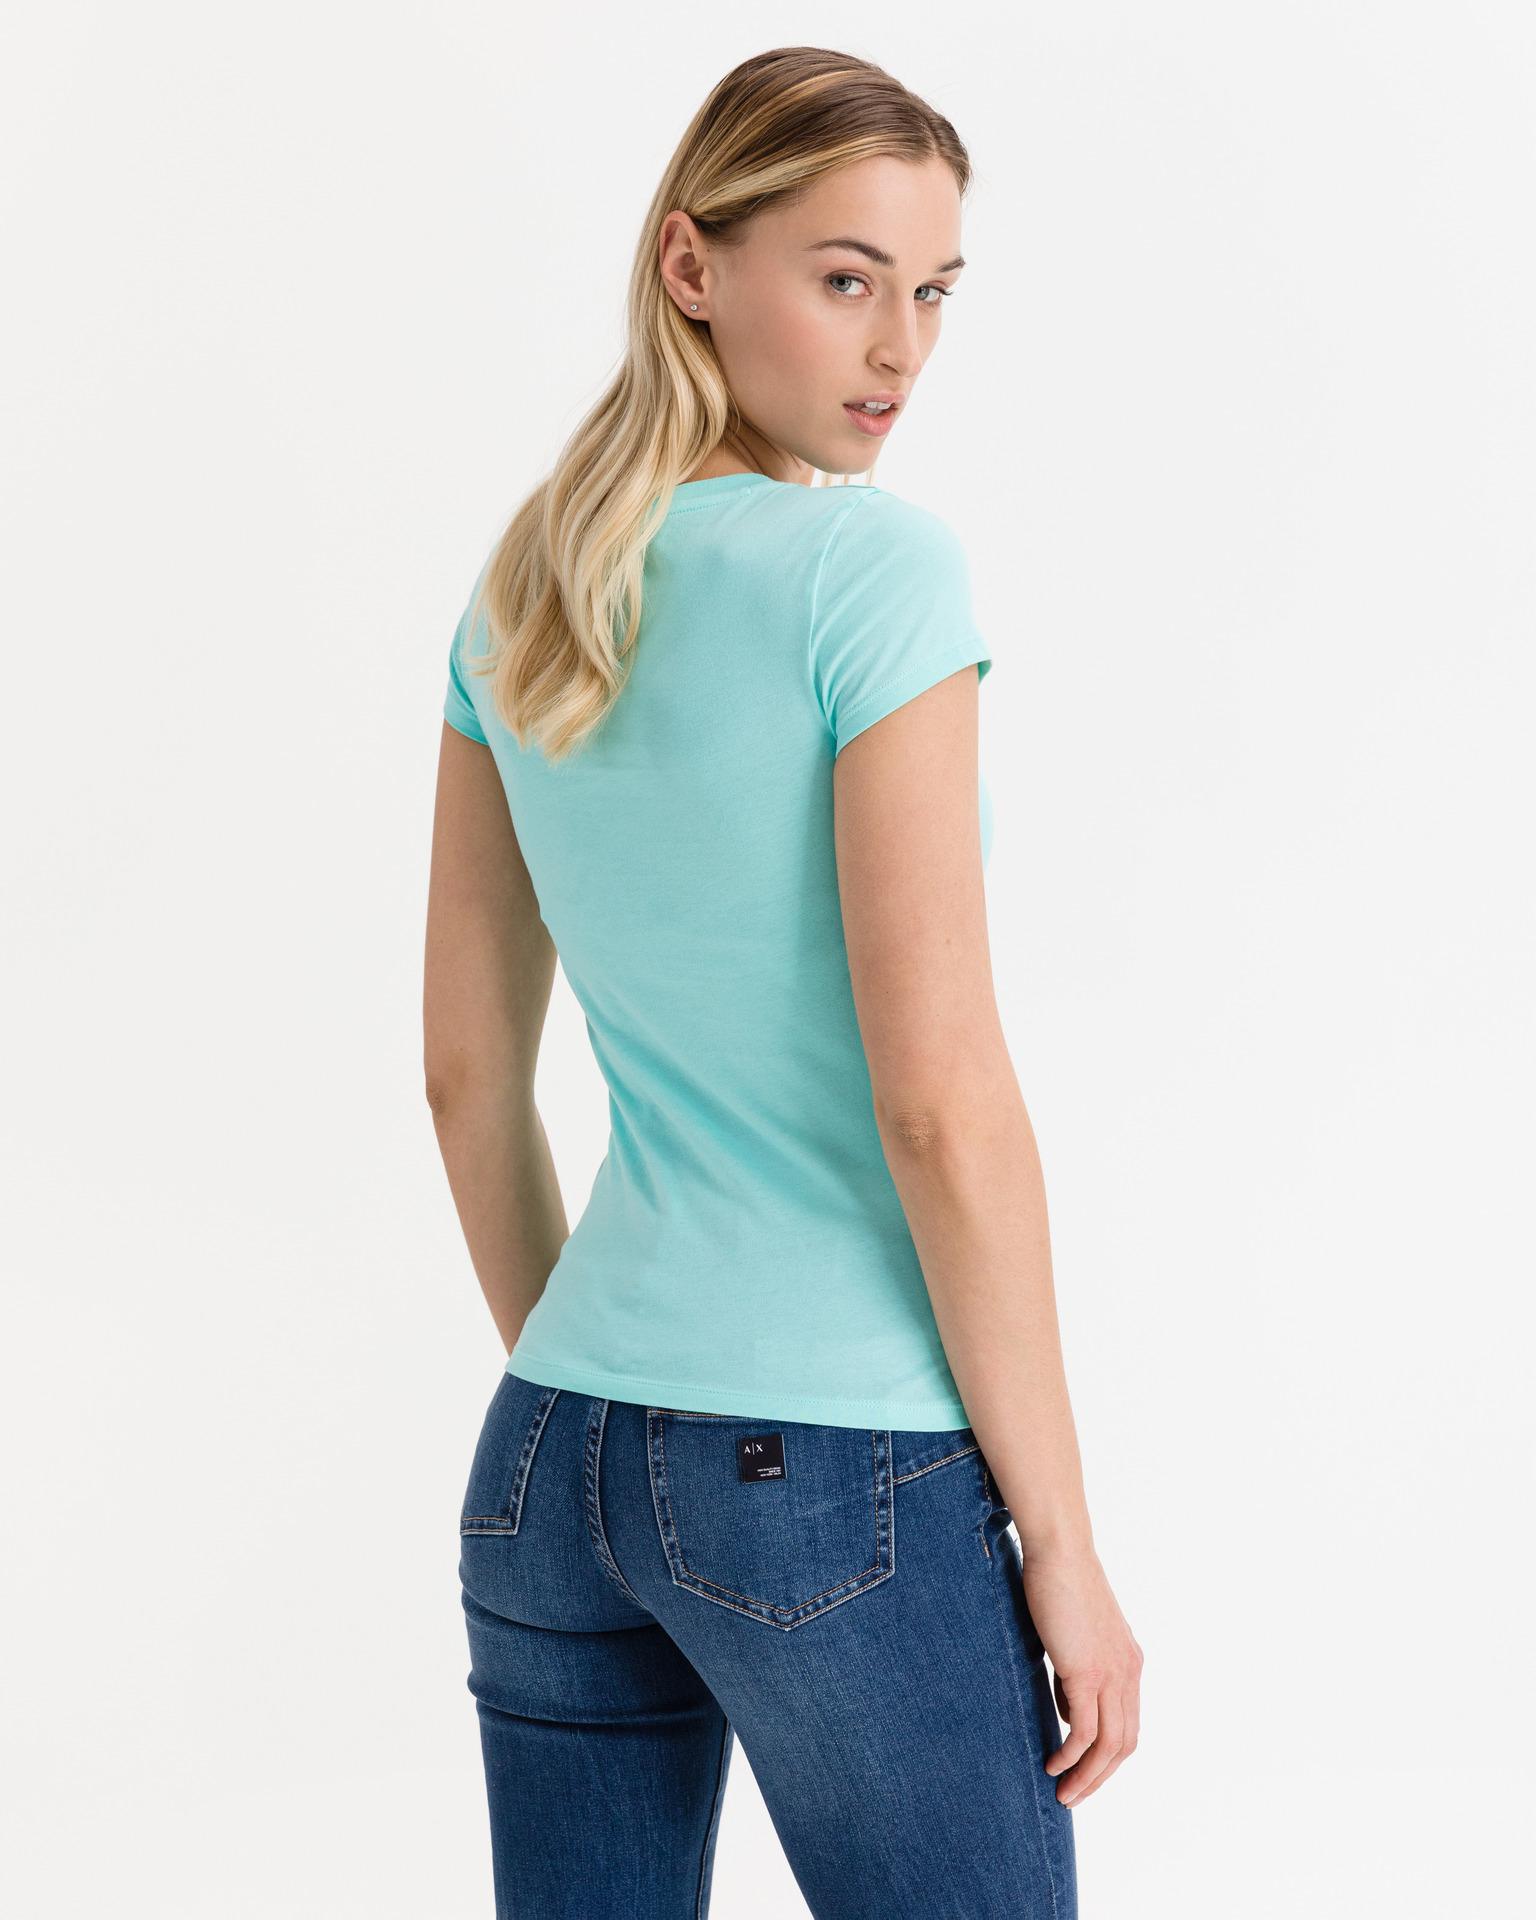 Armani Exchange blue women´s T-shirt